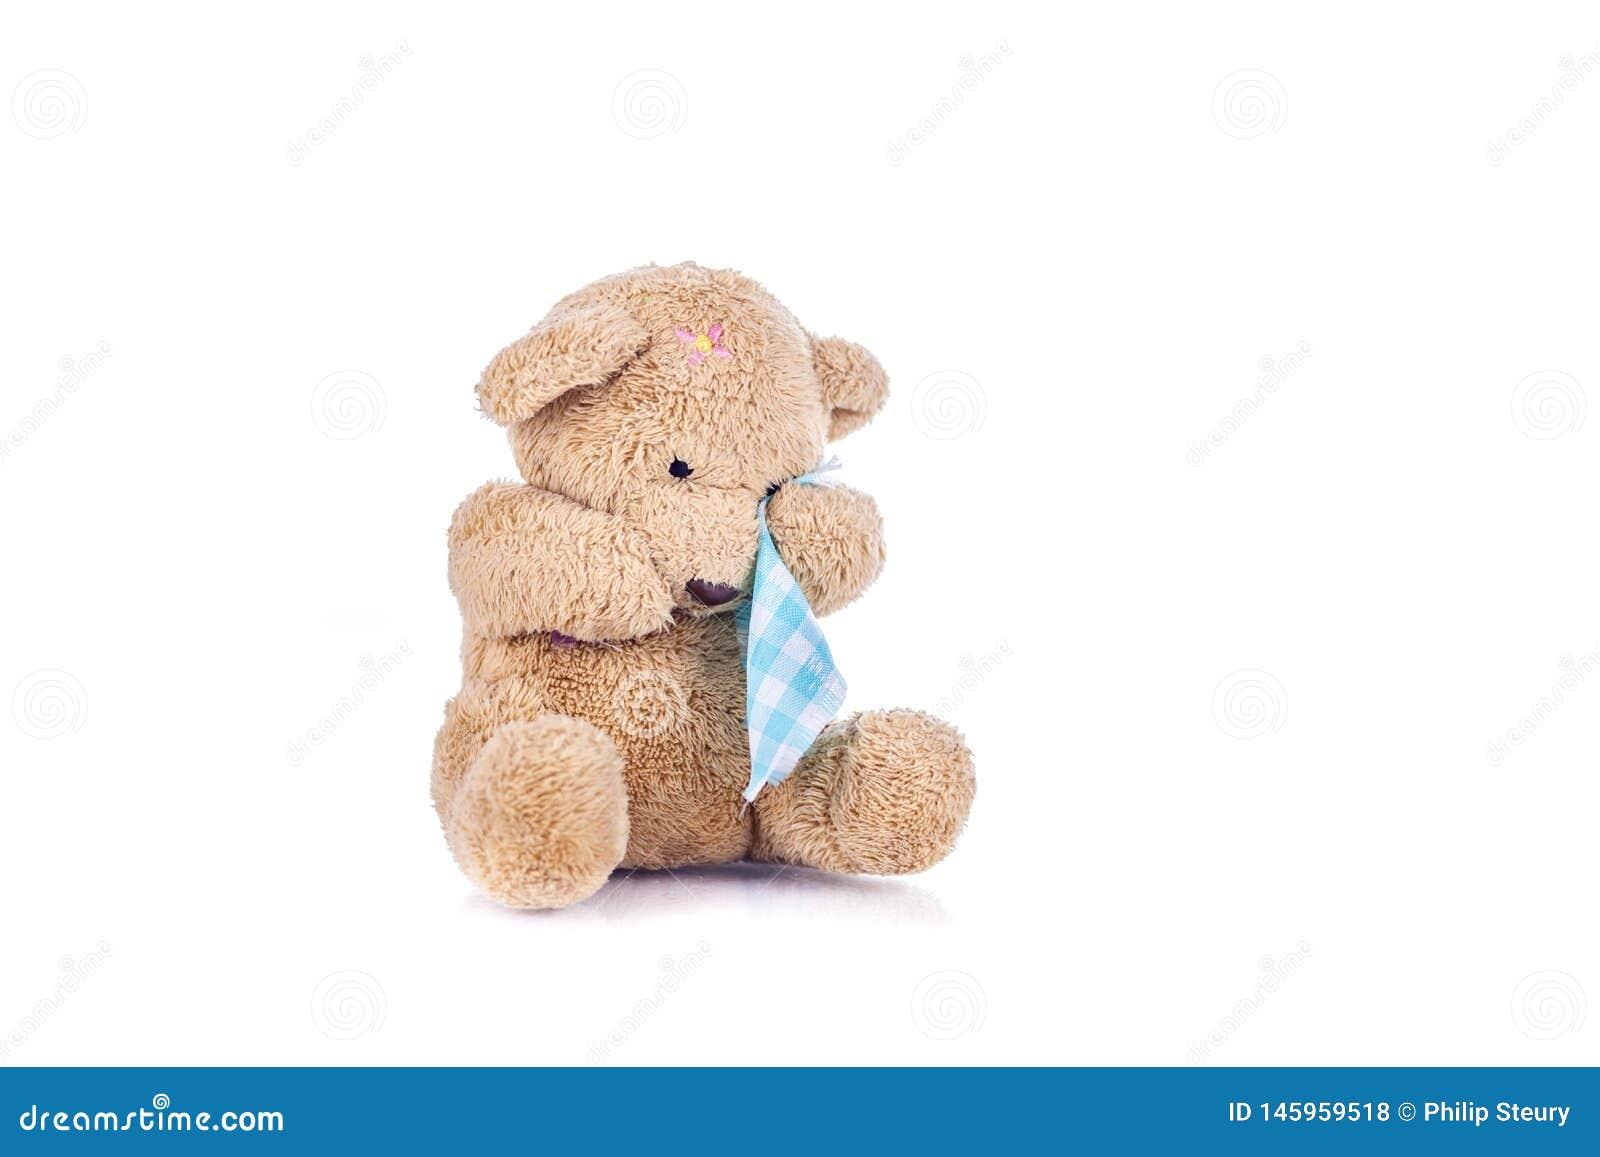 sad-brown-teddy-bear-wiping-his-eyes-blu